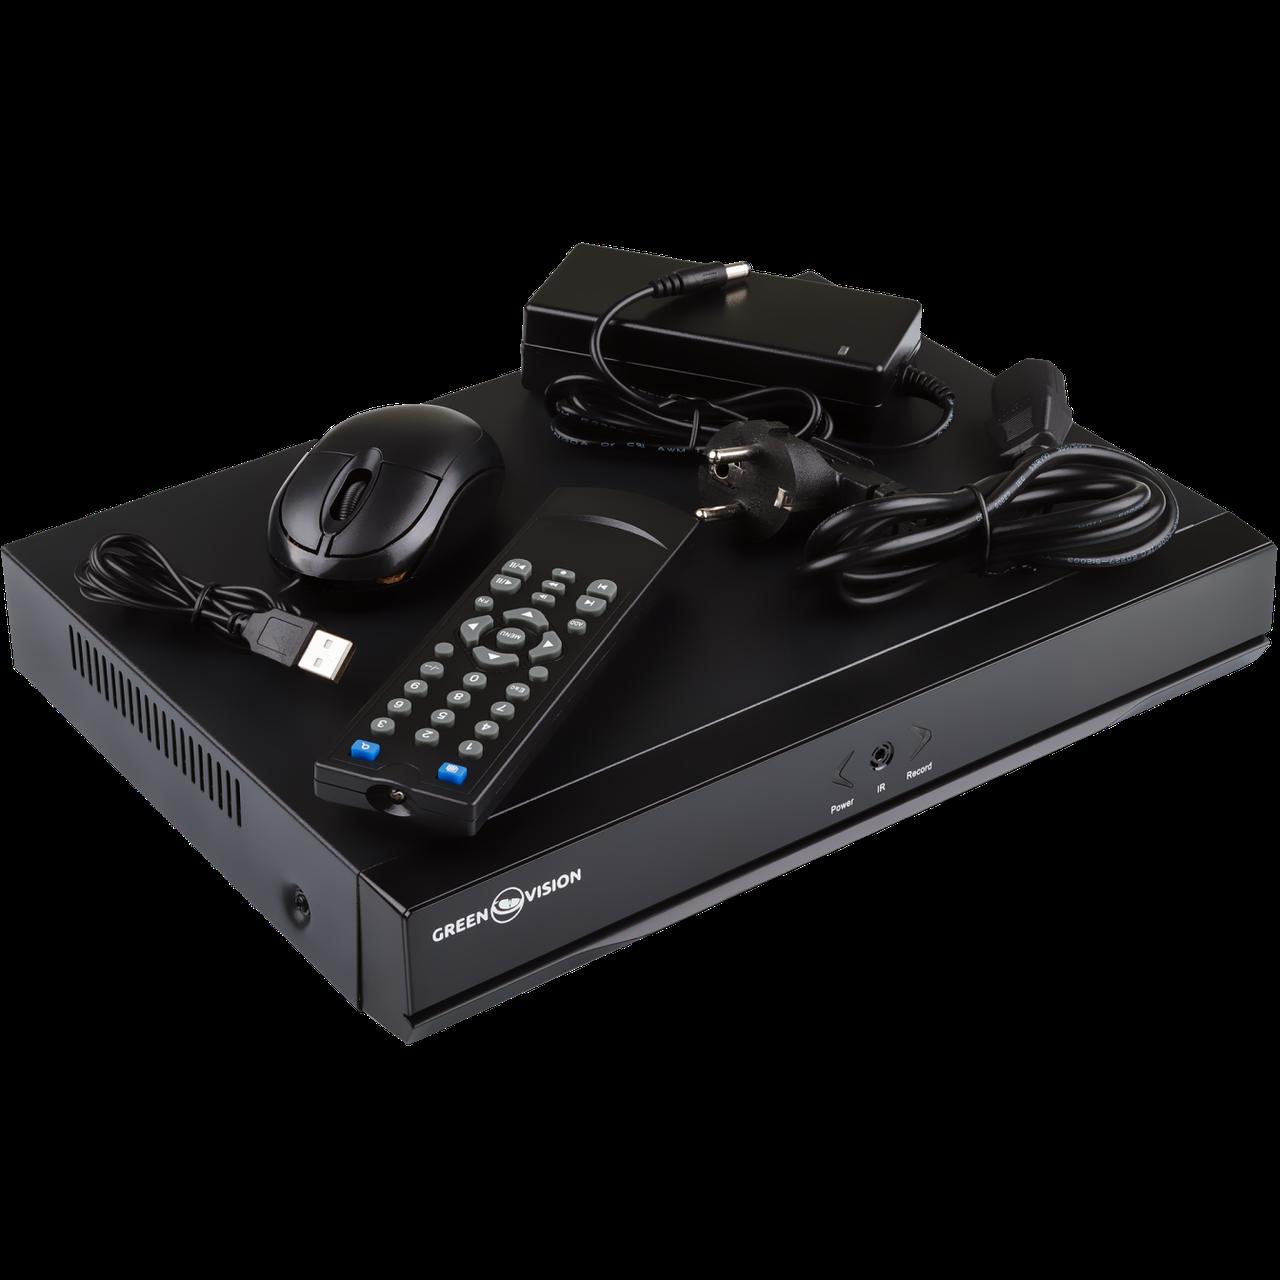 Видеорегистратор NVR для IP камер Green Vision GV-N-S003/16 960P